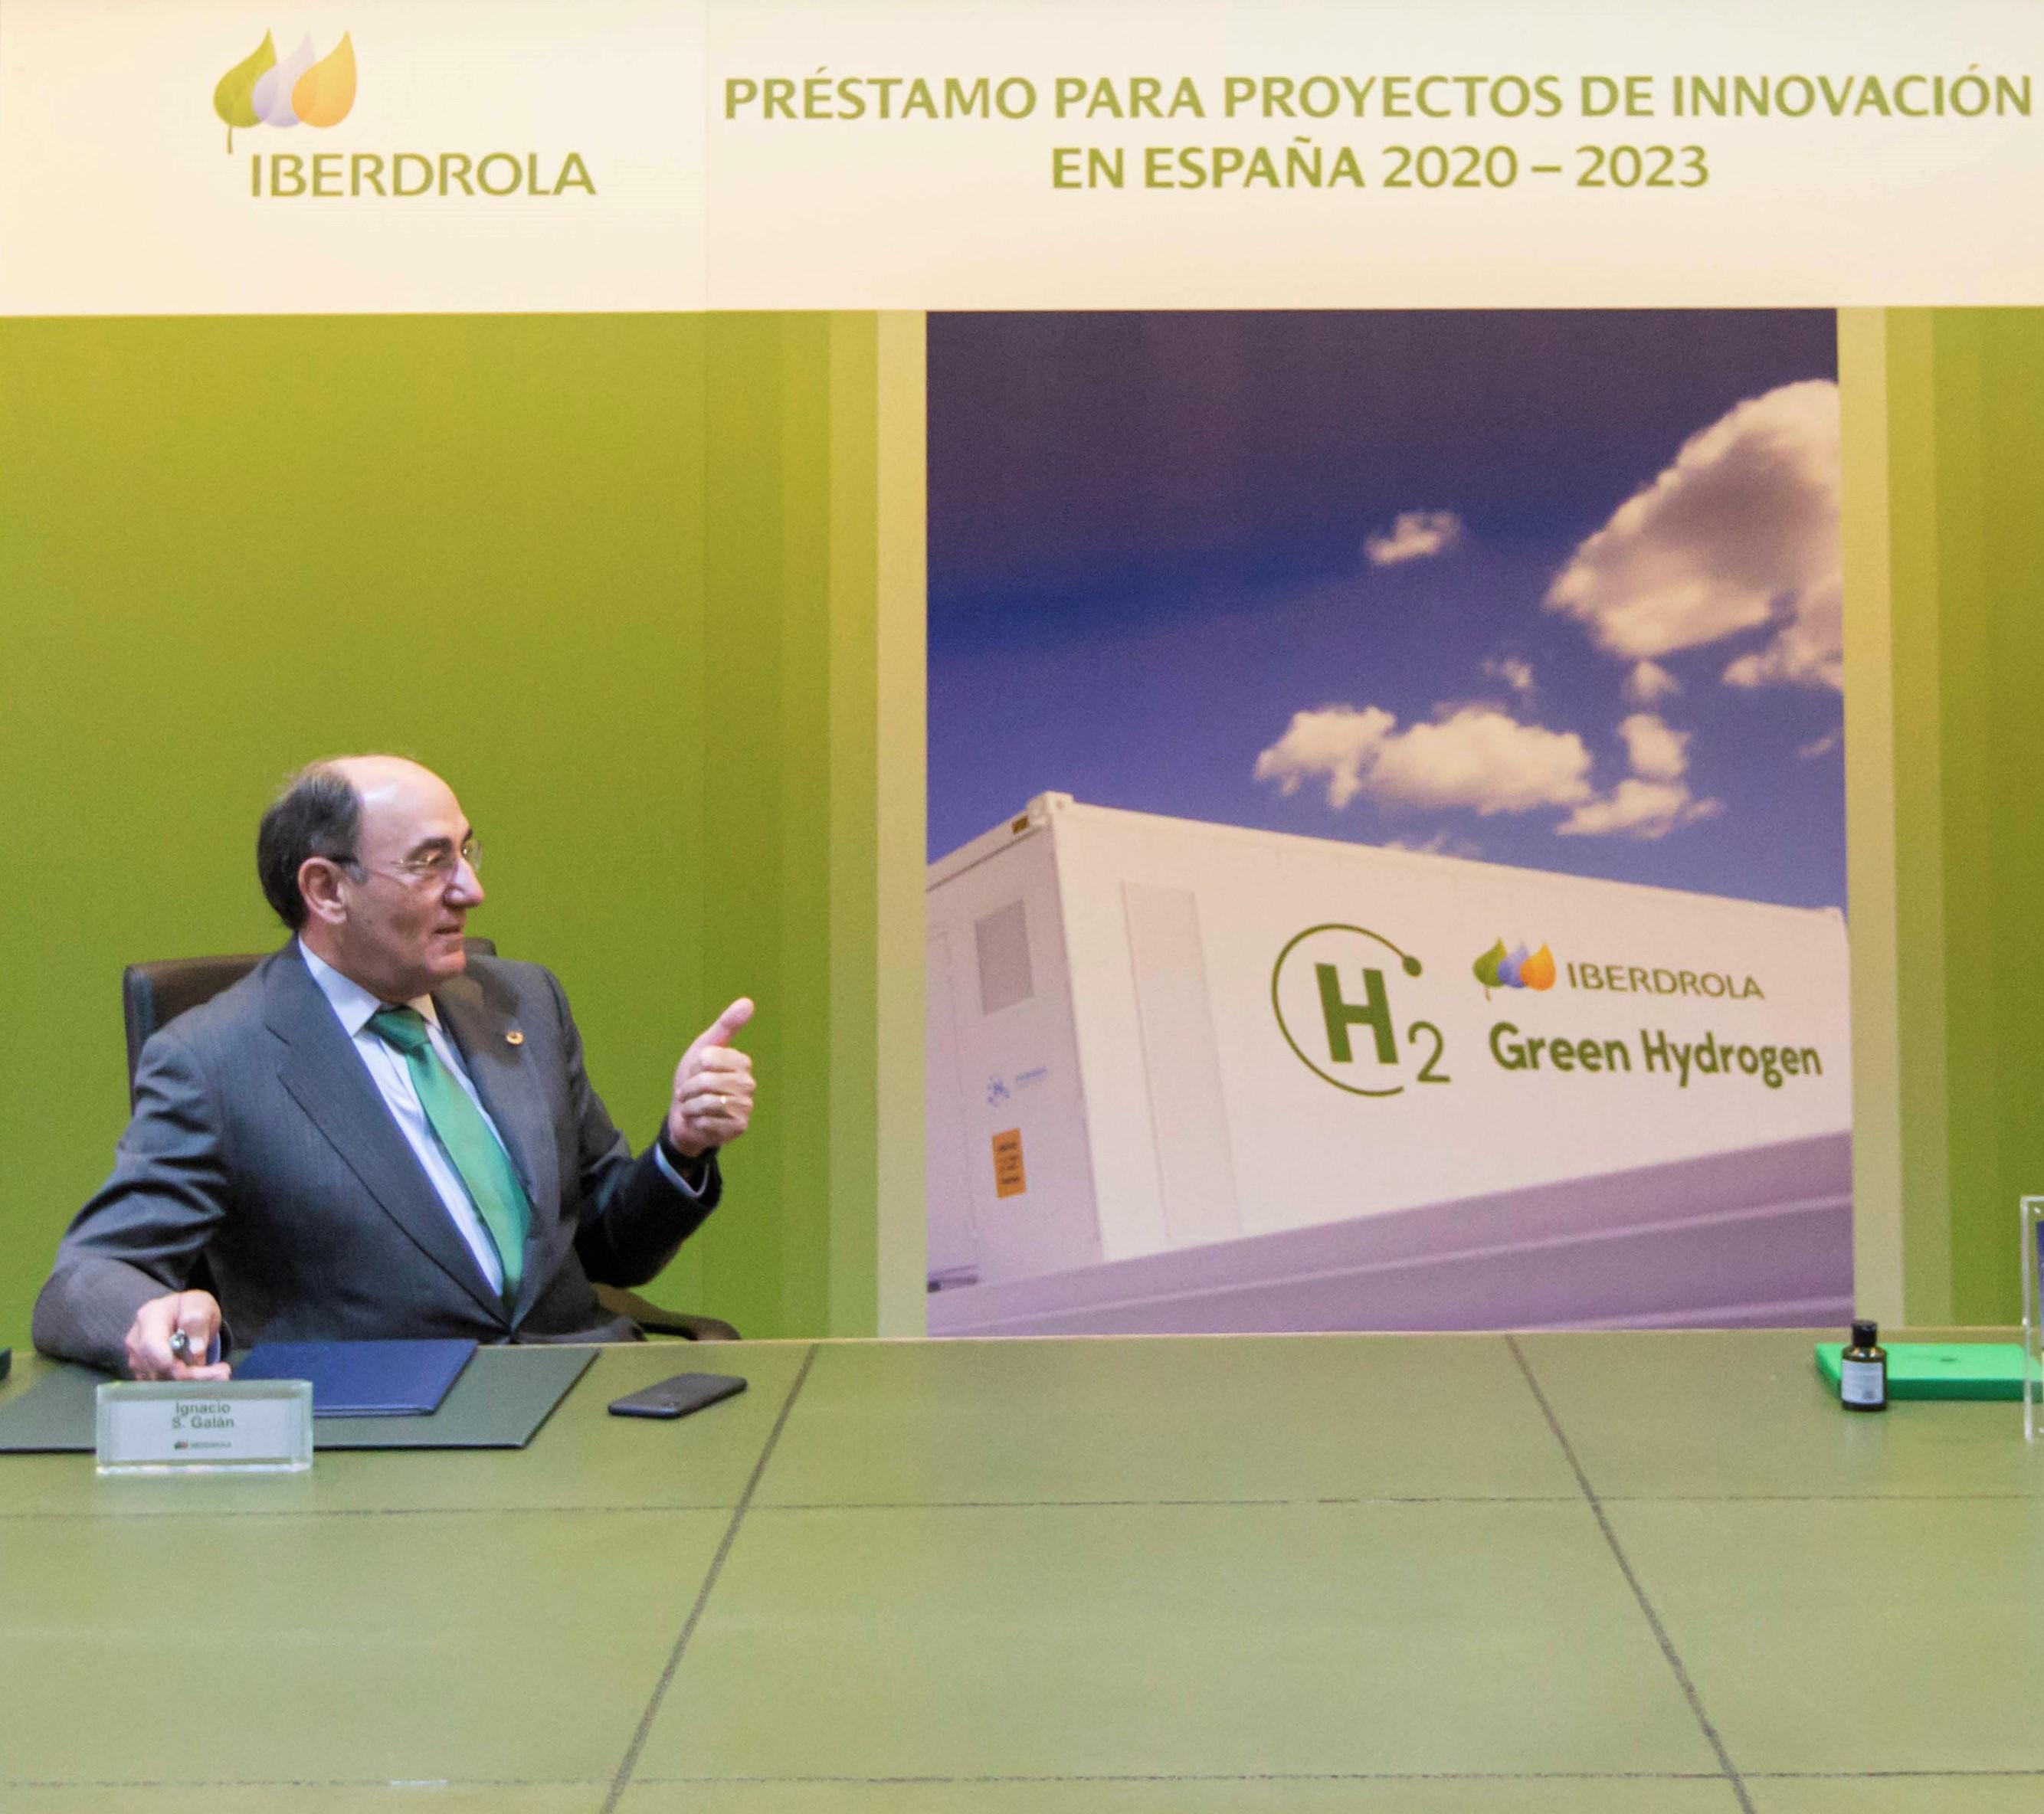 firmapresidenteiberdrolavpbeiespanayportugalinnovacionespana.jpg